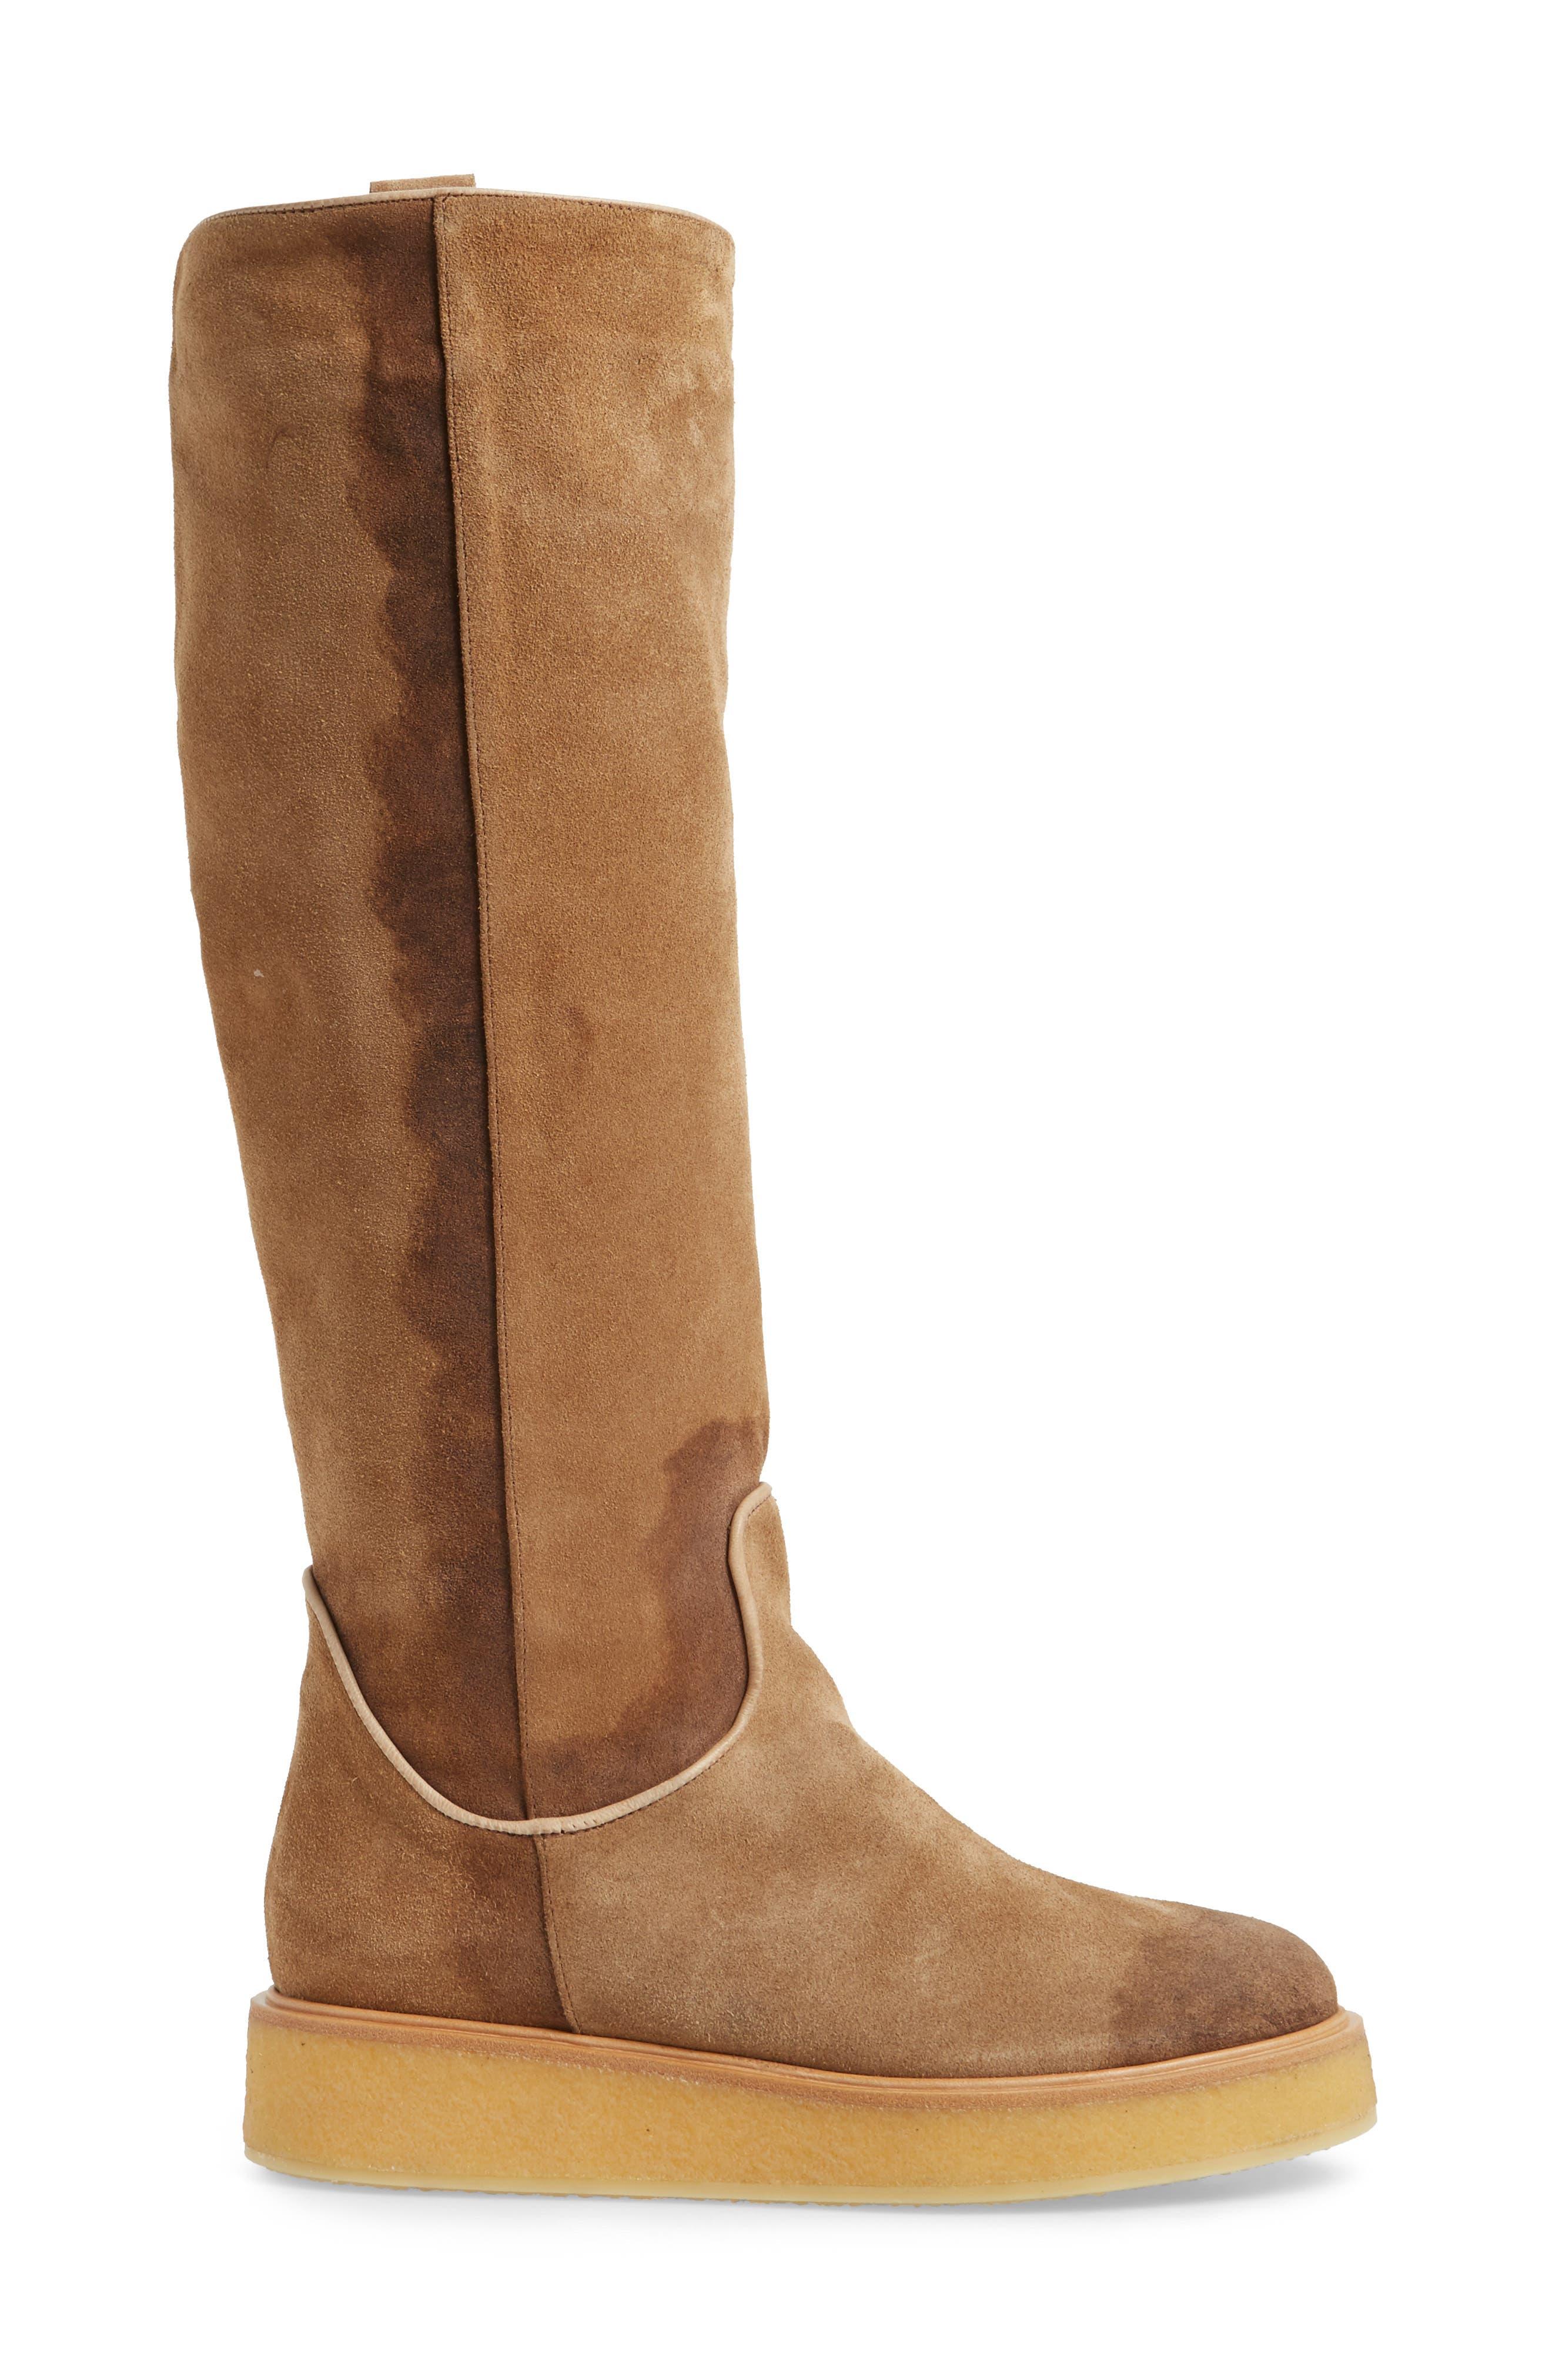 Nerola Knee High Boot,                             Alternate thumbnail 3, color,                             200